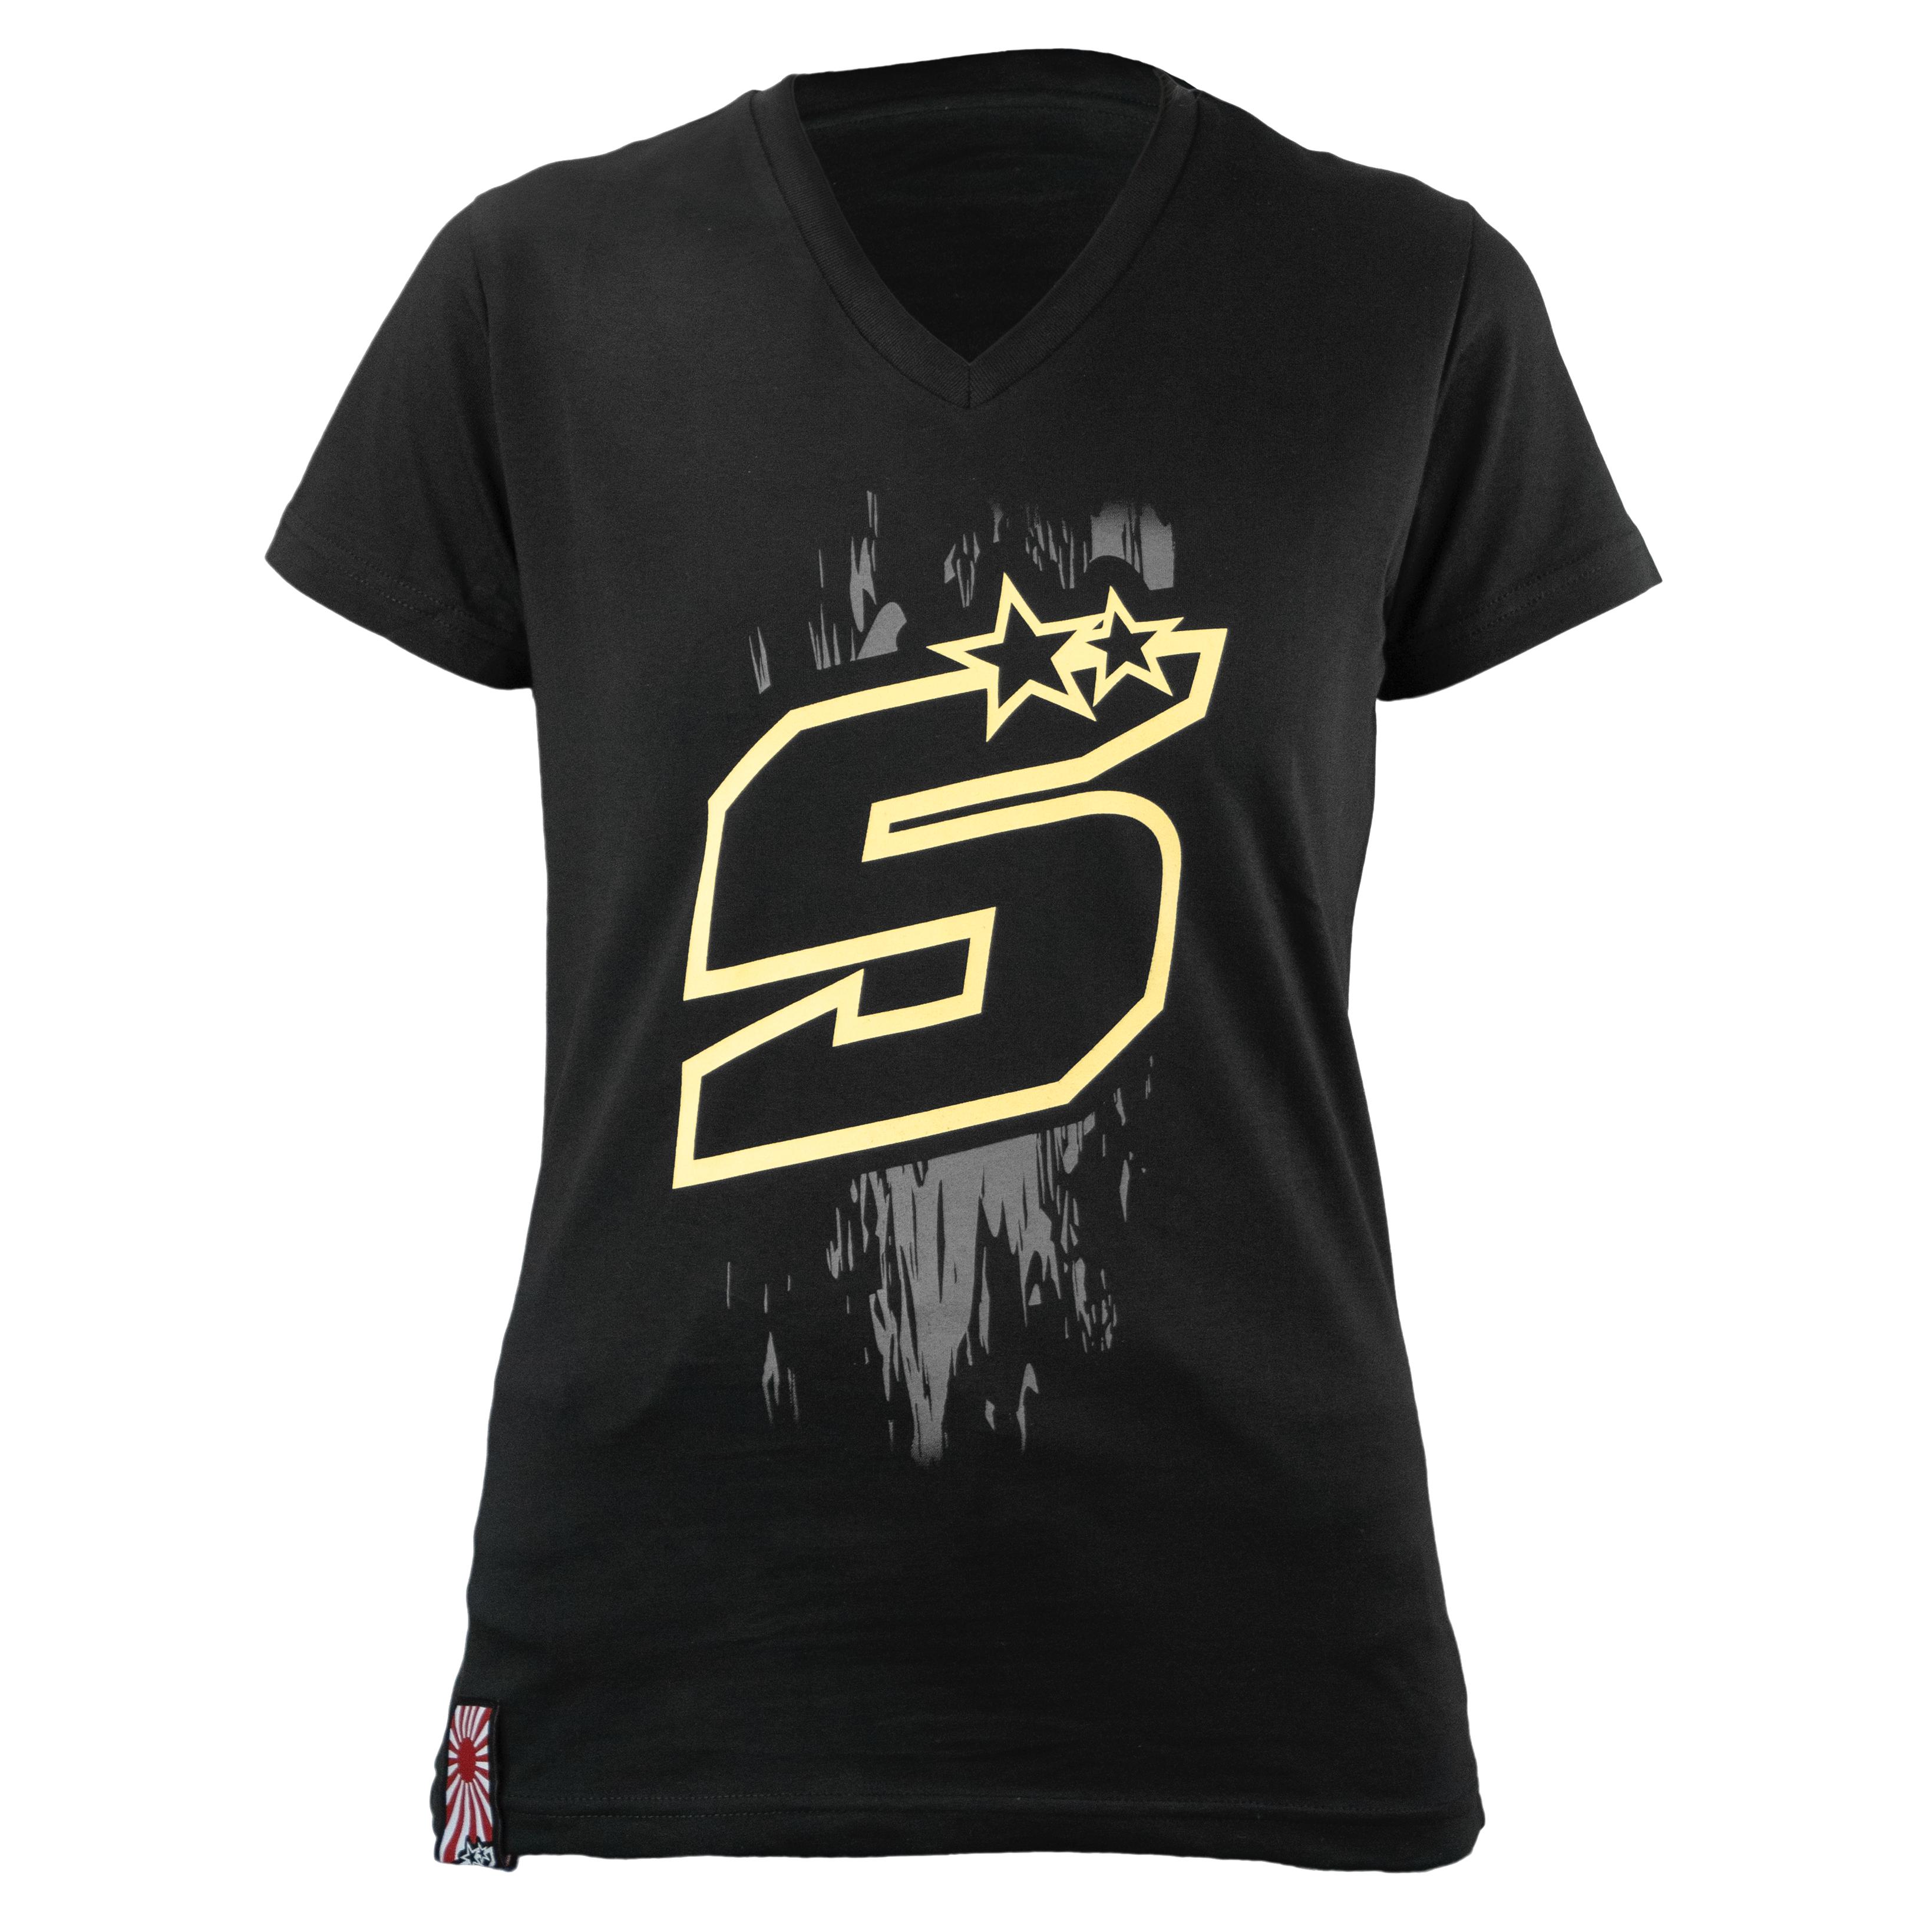 zarco-Tee Shirt Zarco Z5 D Gold Woman